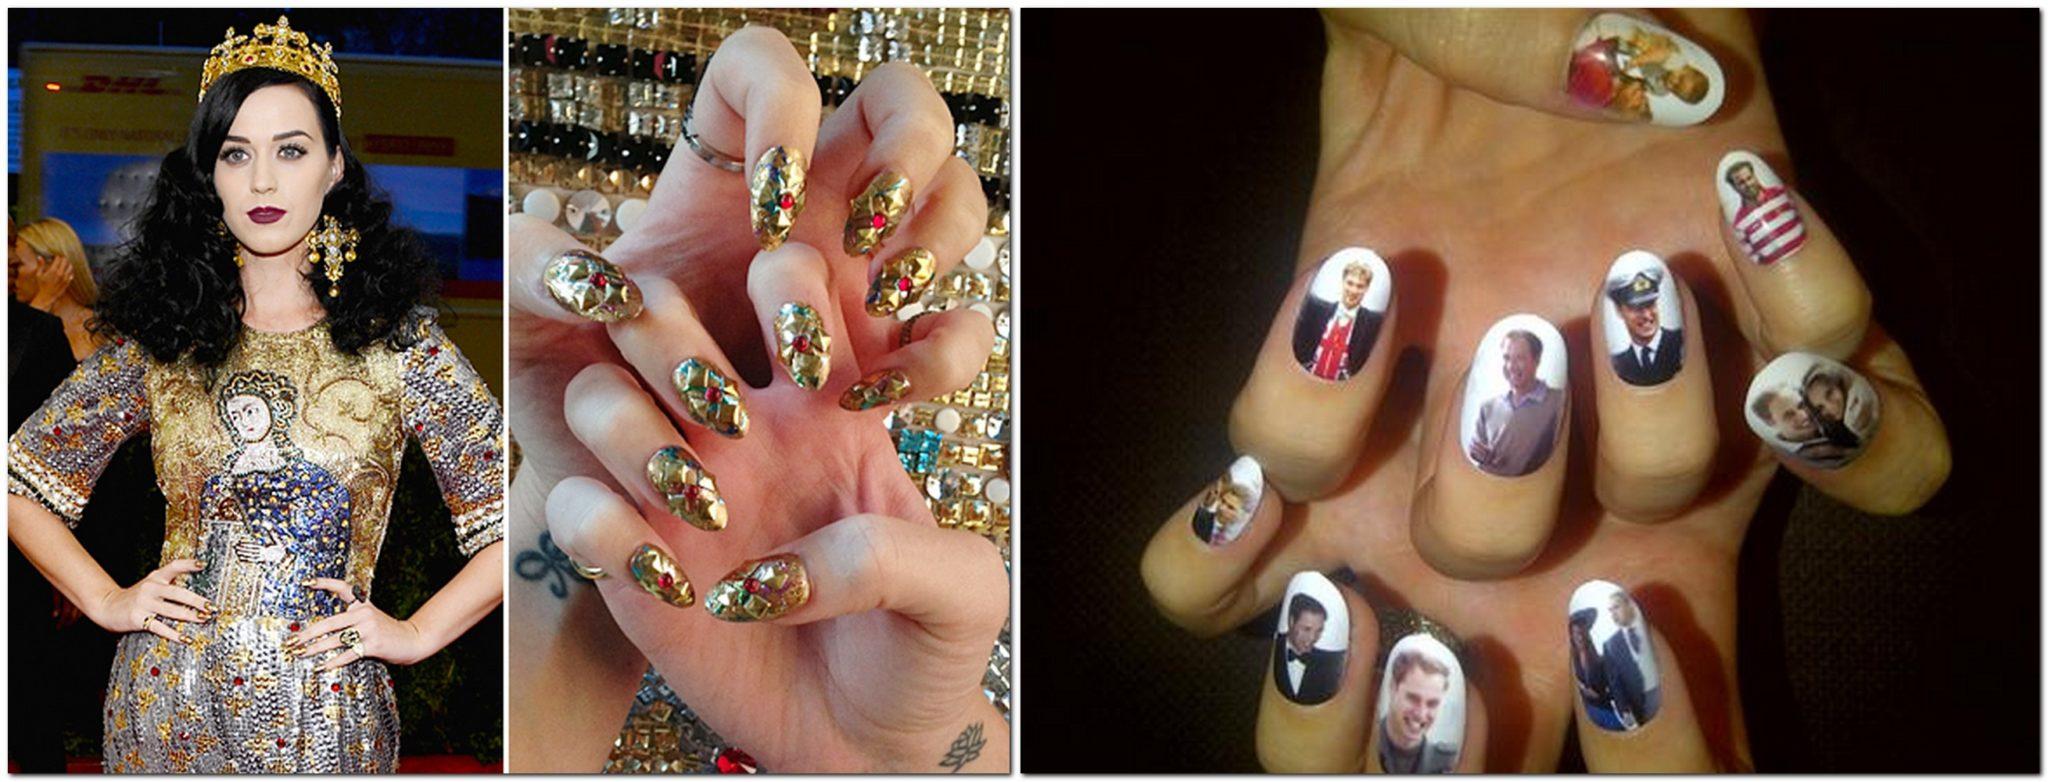 celebs-expensive-manicure-9-4